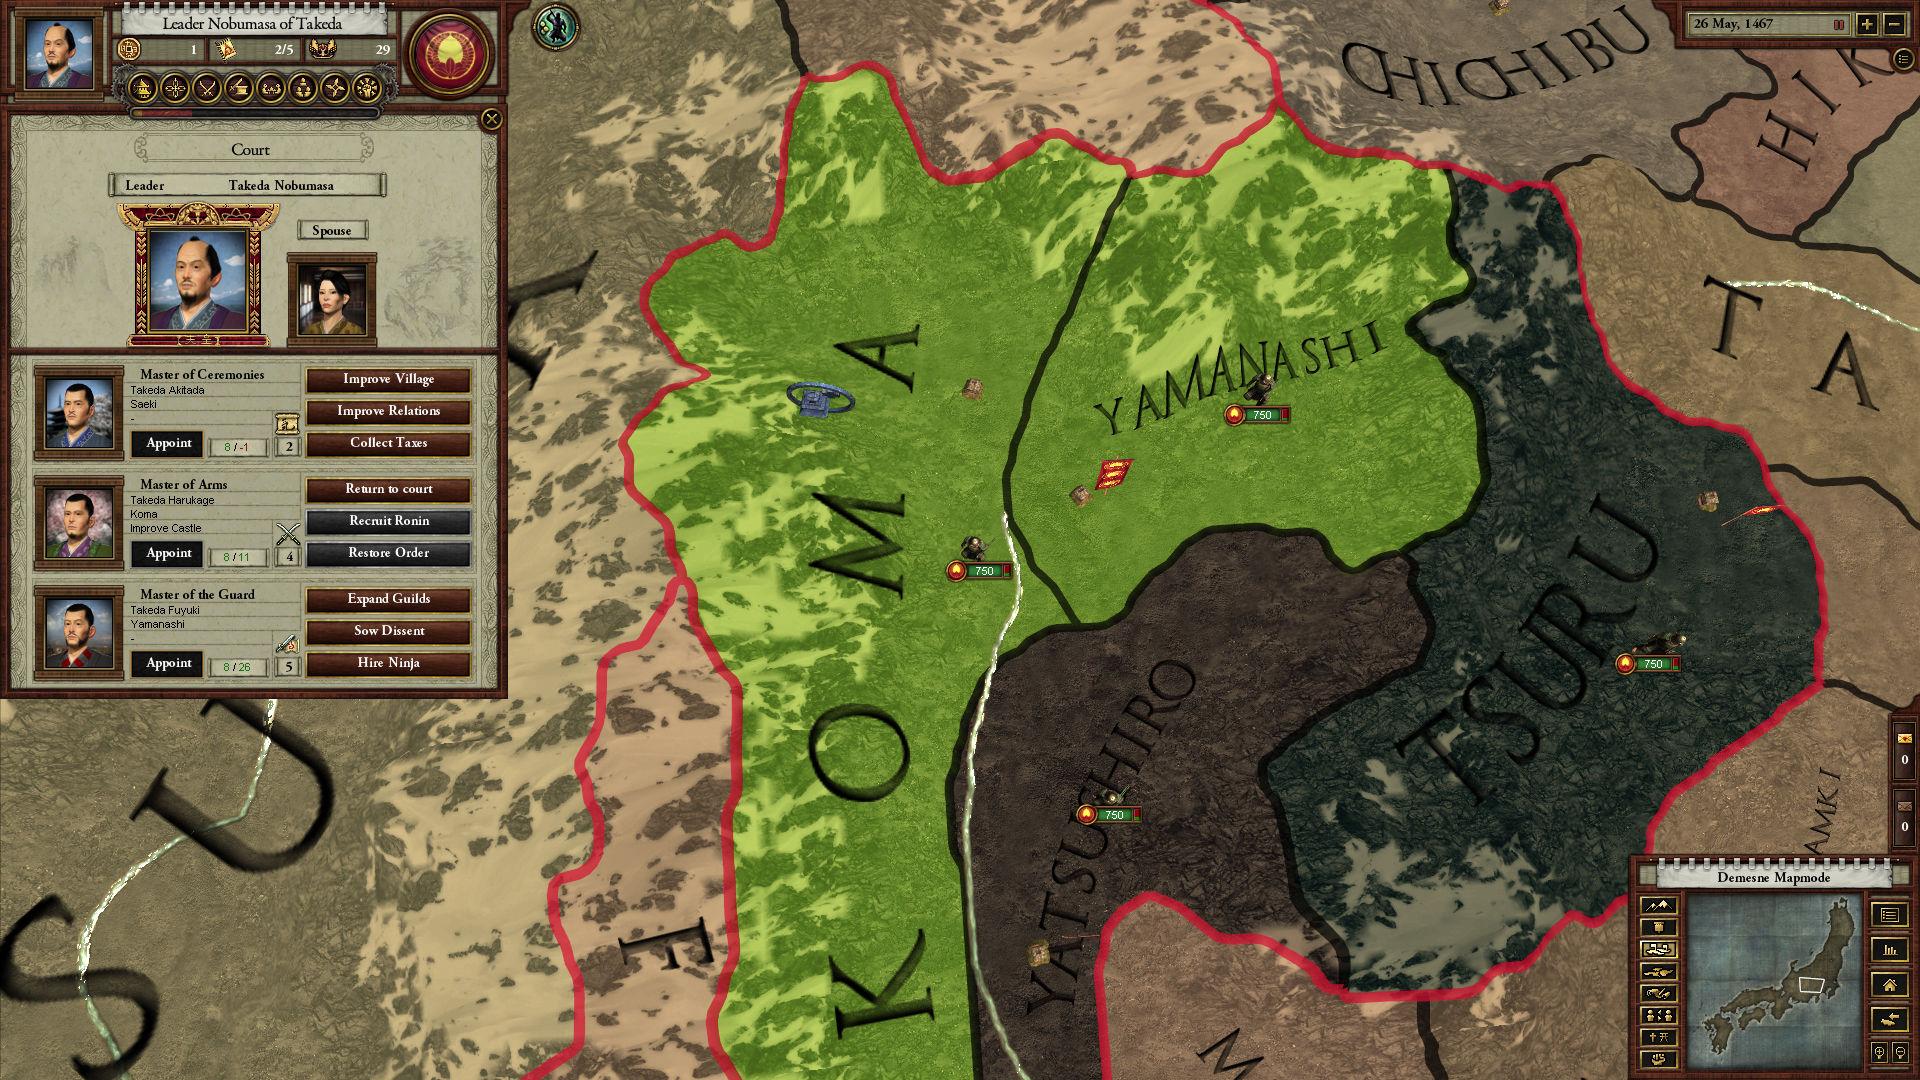 Sengoku screenshot 3